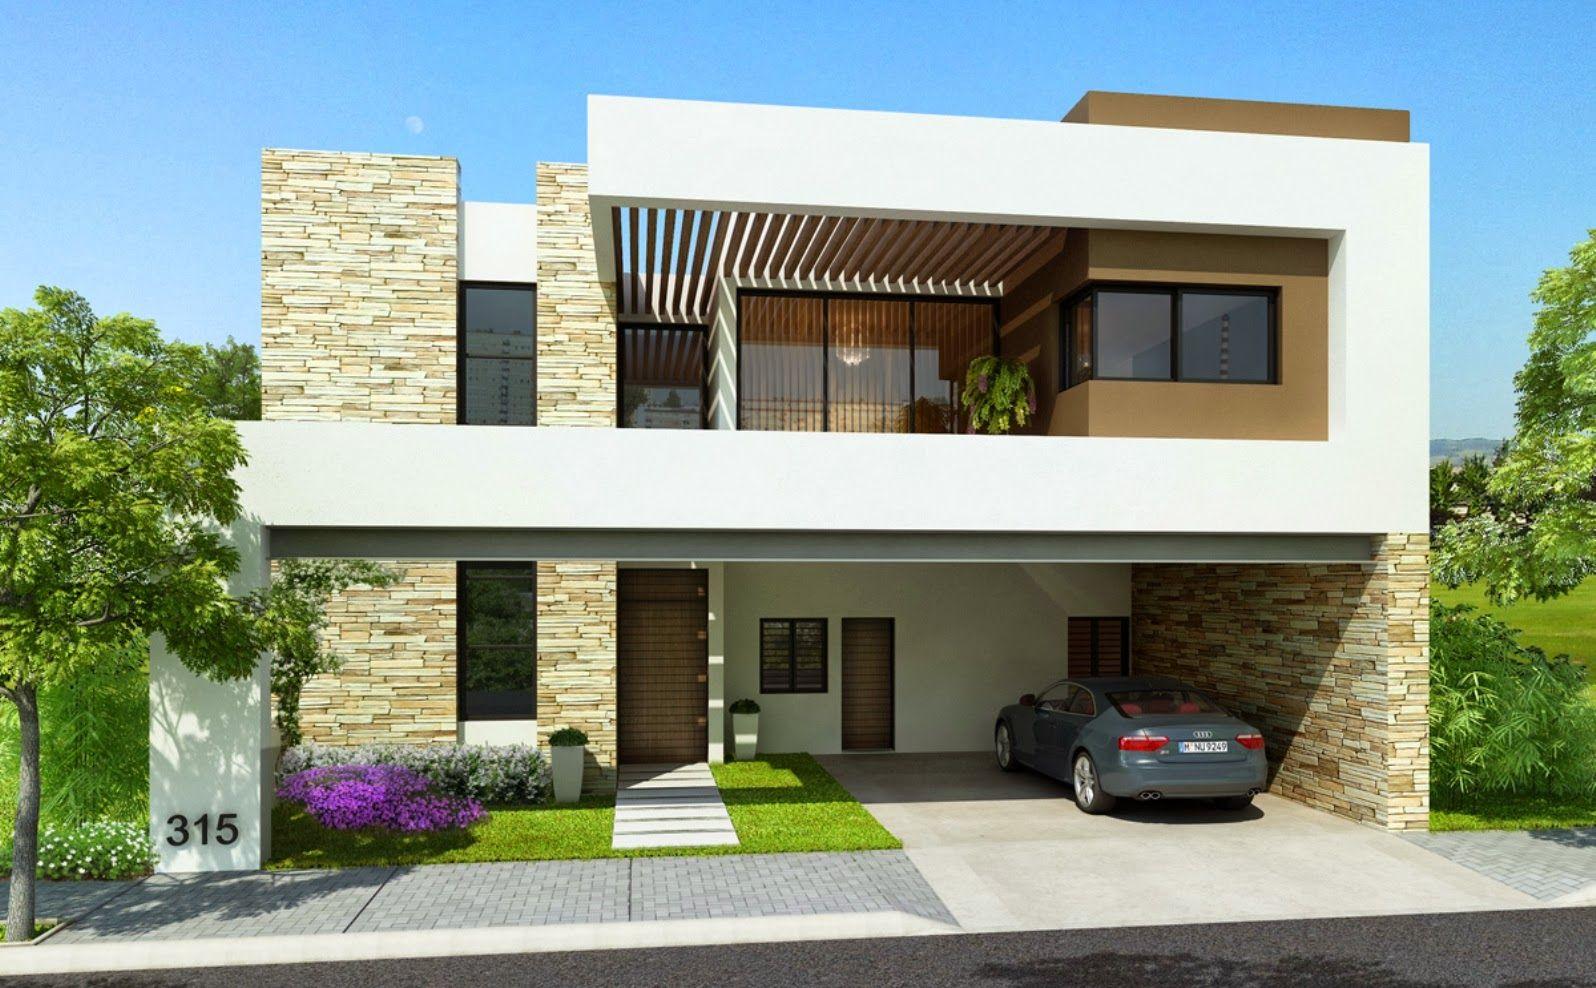 casas economicas pesquisa google projetos de casas pequenos lotes casa econ mica projetos. Black Bedroom Furniture Sets. Home Design Ideas